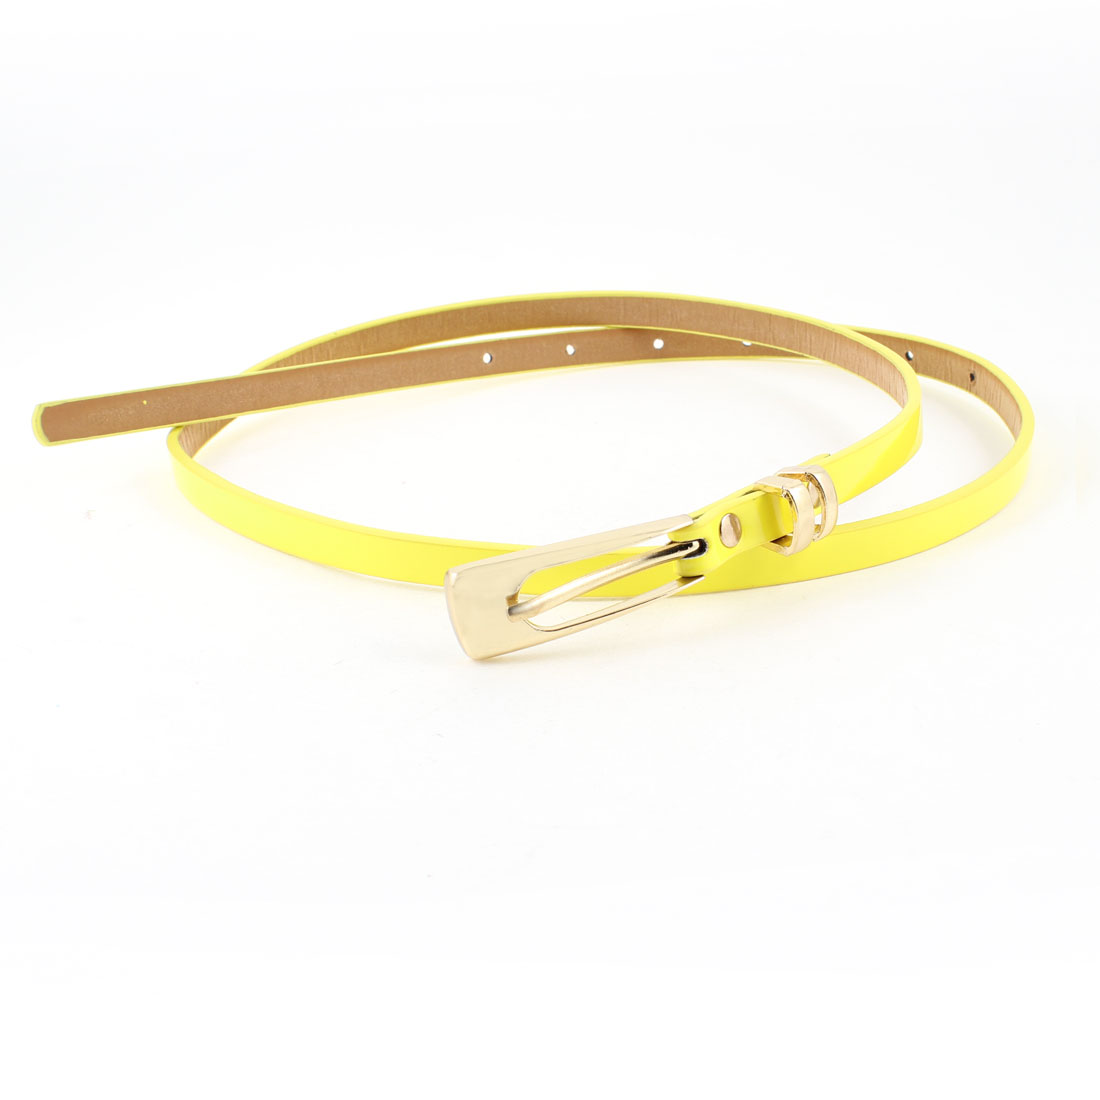 Ladies Adjustable Seven Holes Perforated Slim Belt Waistband Yellow